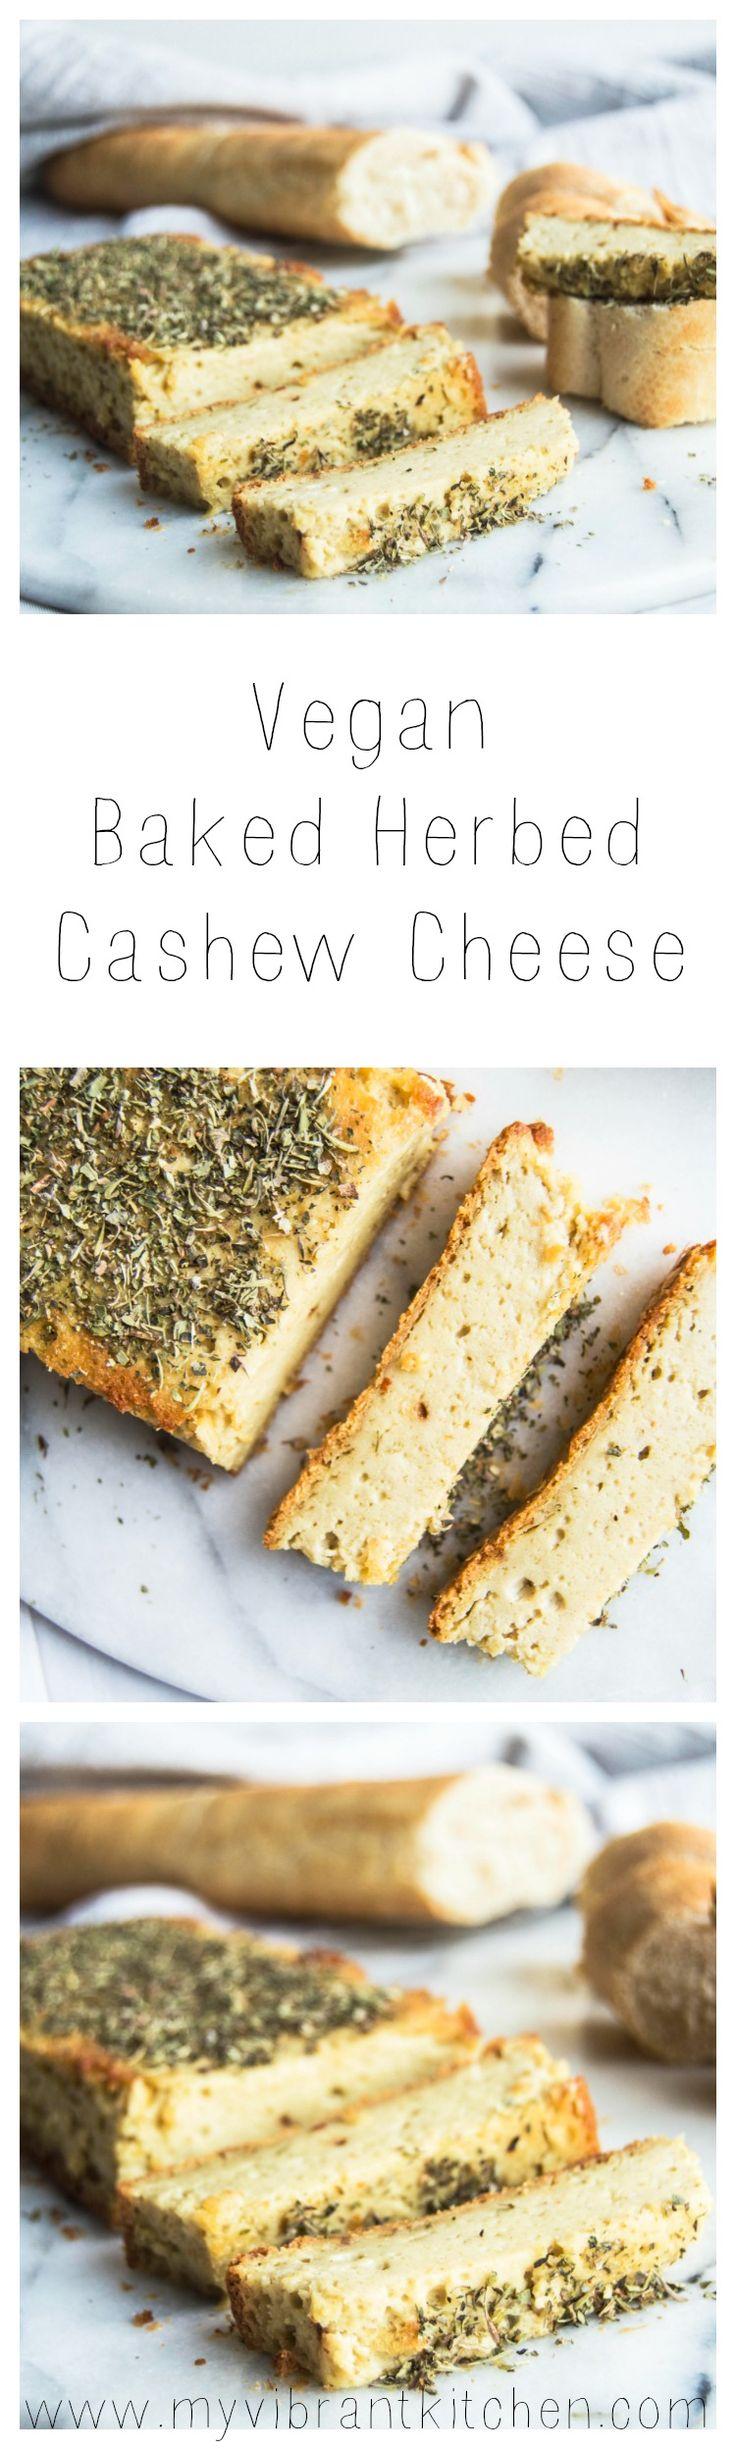 My Vibrant Kitchen | Vegan Baked Herbed Cashew Cheese | myvibrantkitchen.com